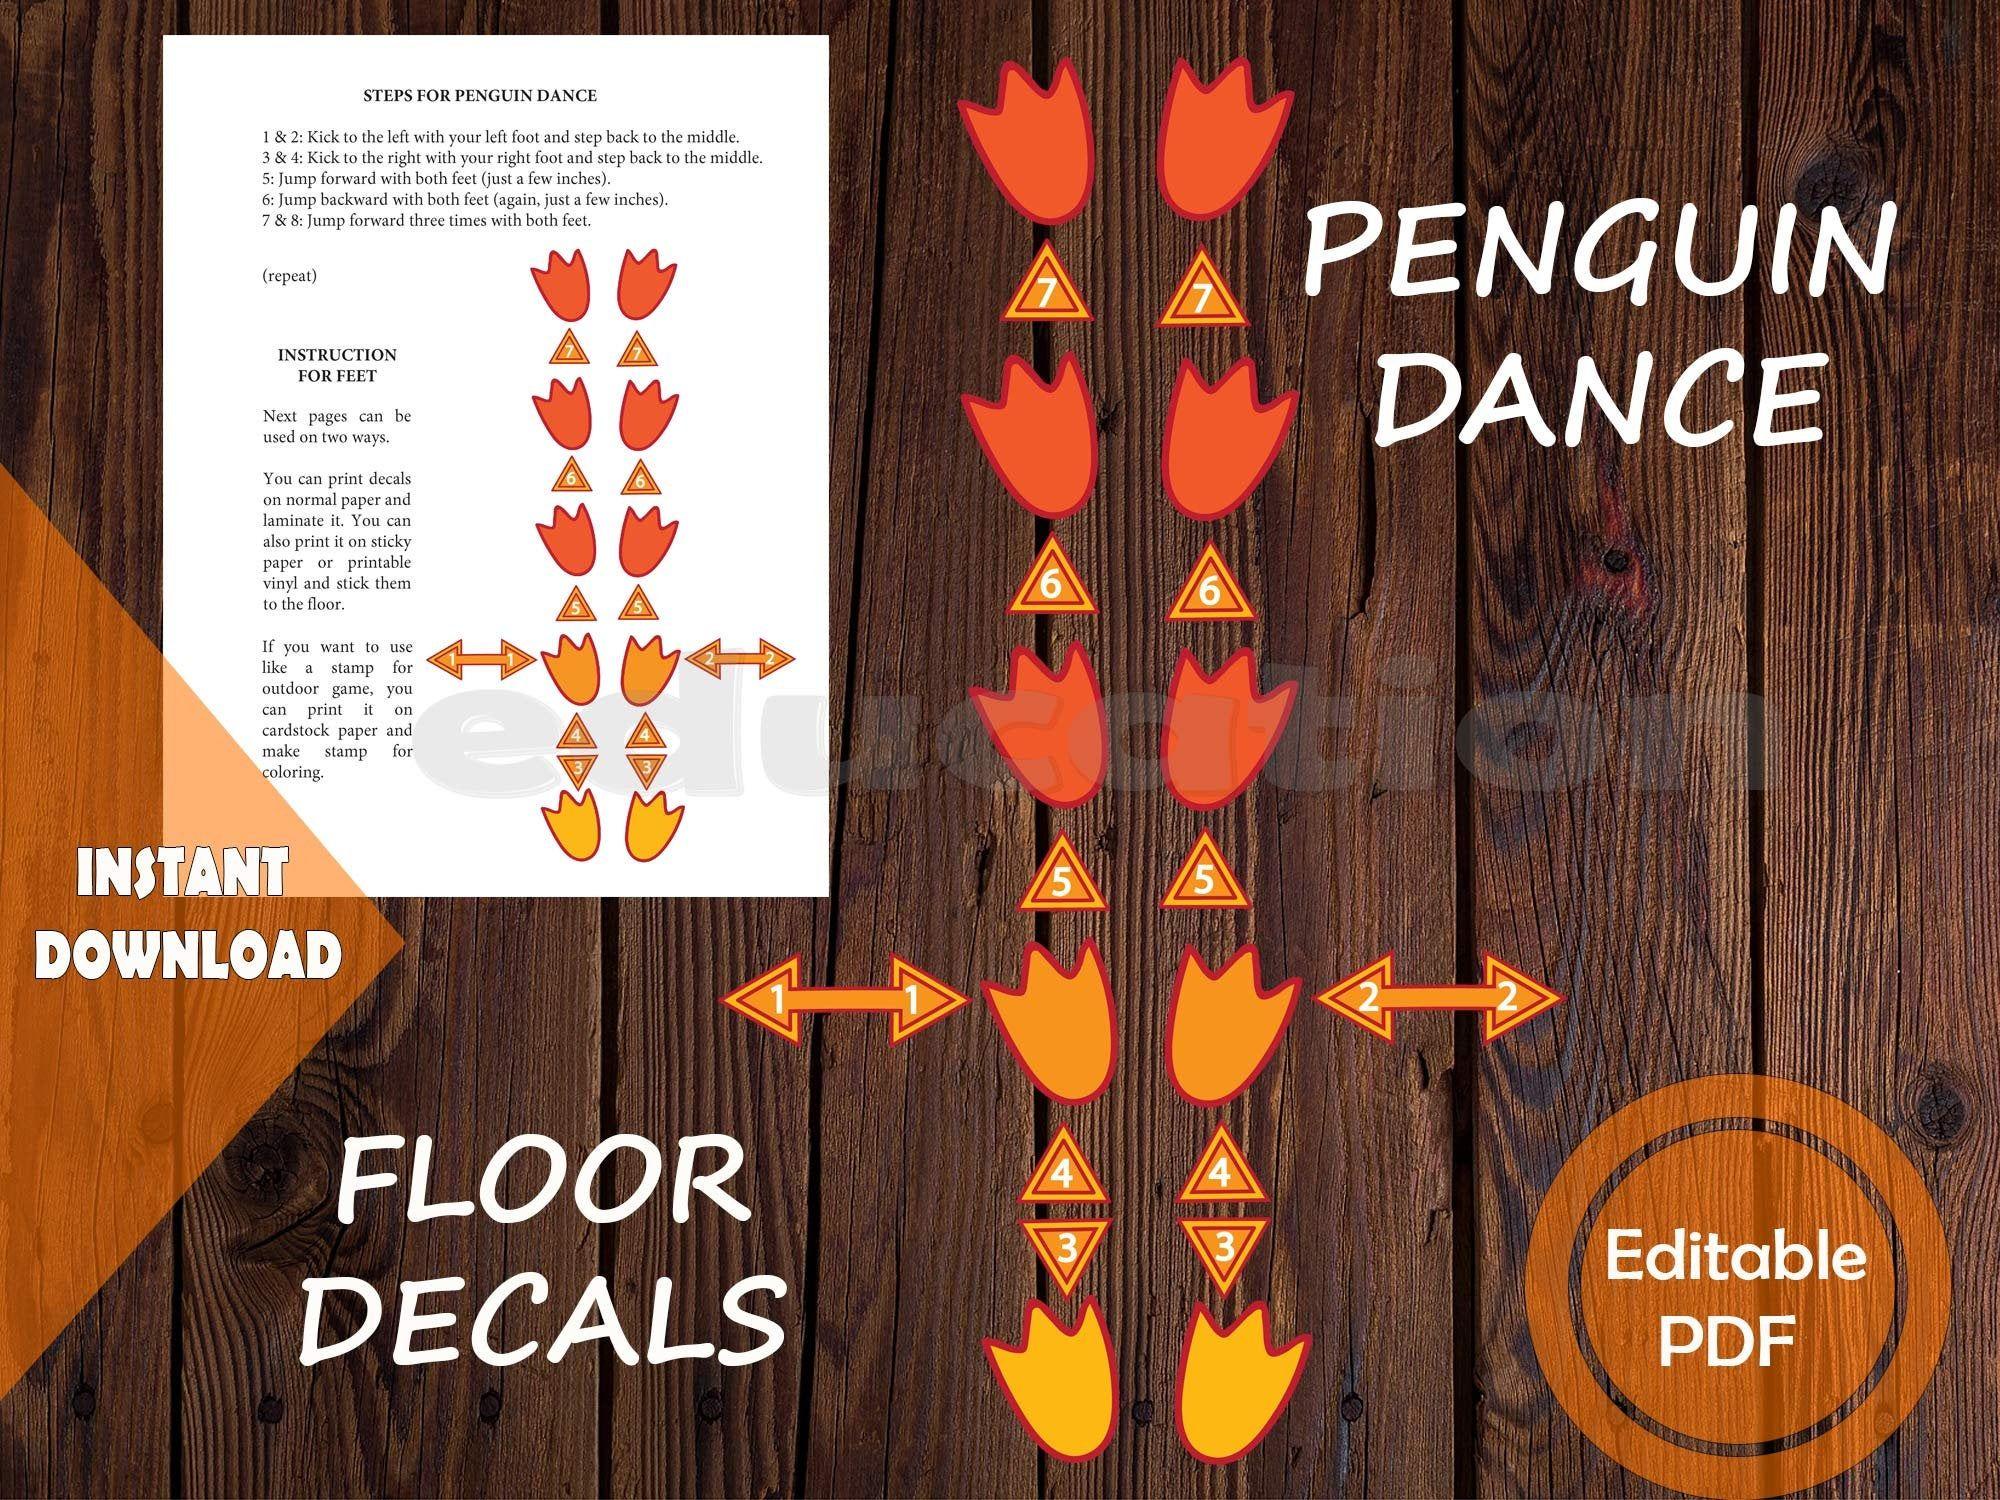 Penguin Anatomy Poster And Sensory Path Printable